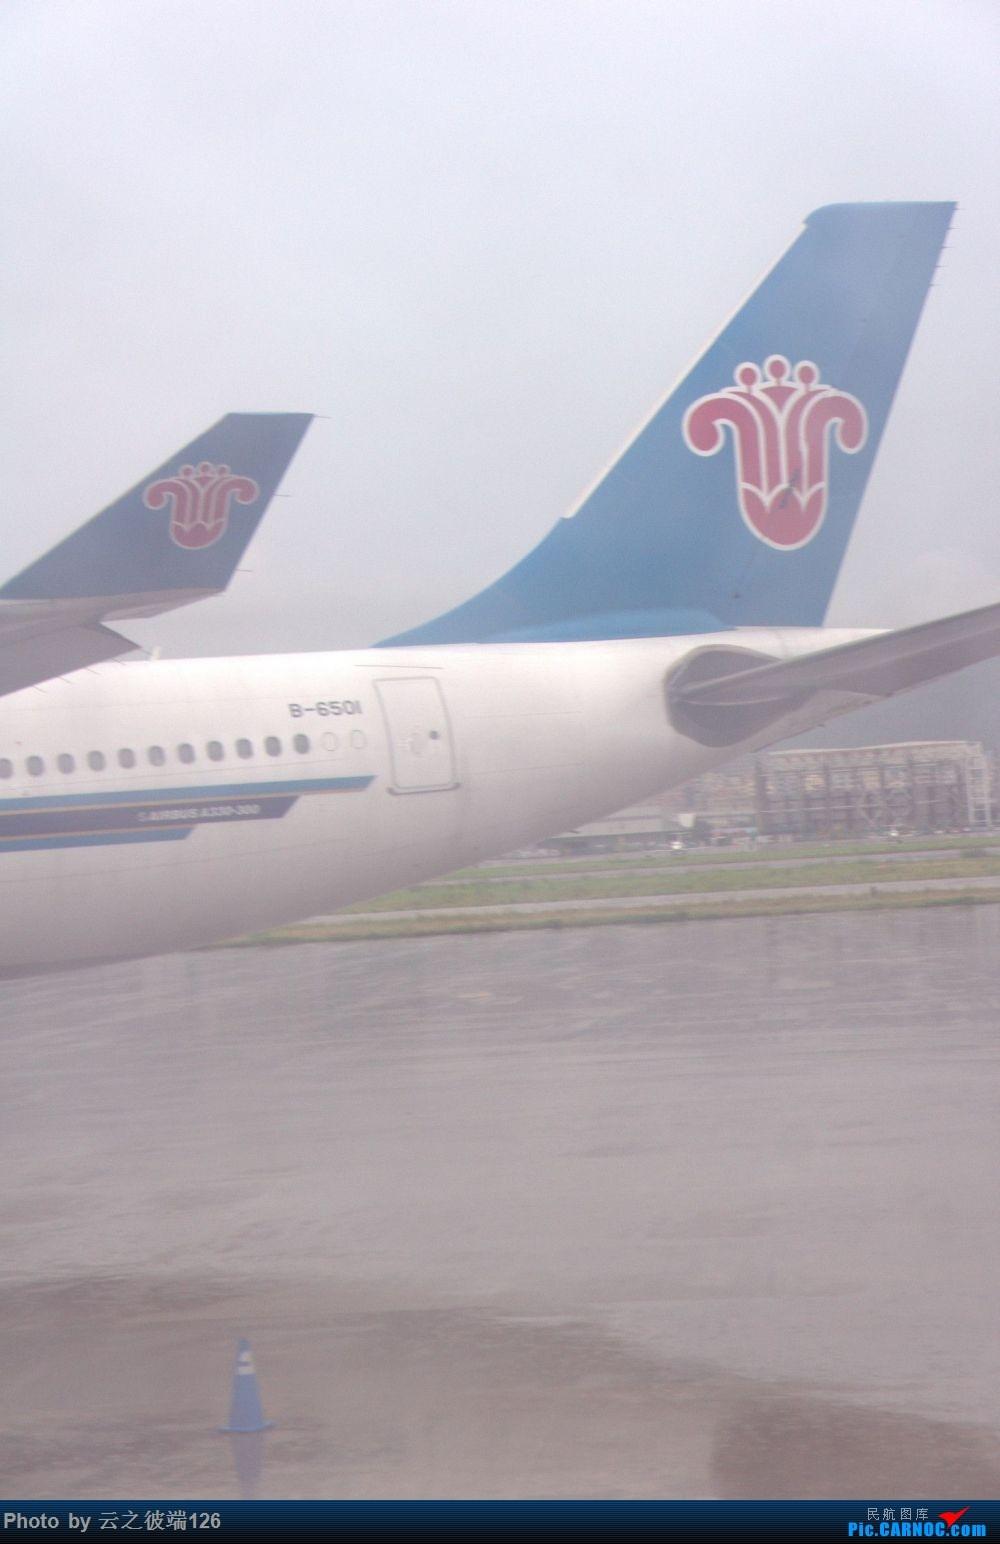 Re:[原创]迟到两年的游记 -----------NKG-SZX-NKG ZH+白菜航------ AIRBUS A330-300 B-6501 中国深圳宝安国际机场